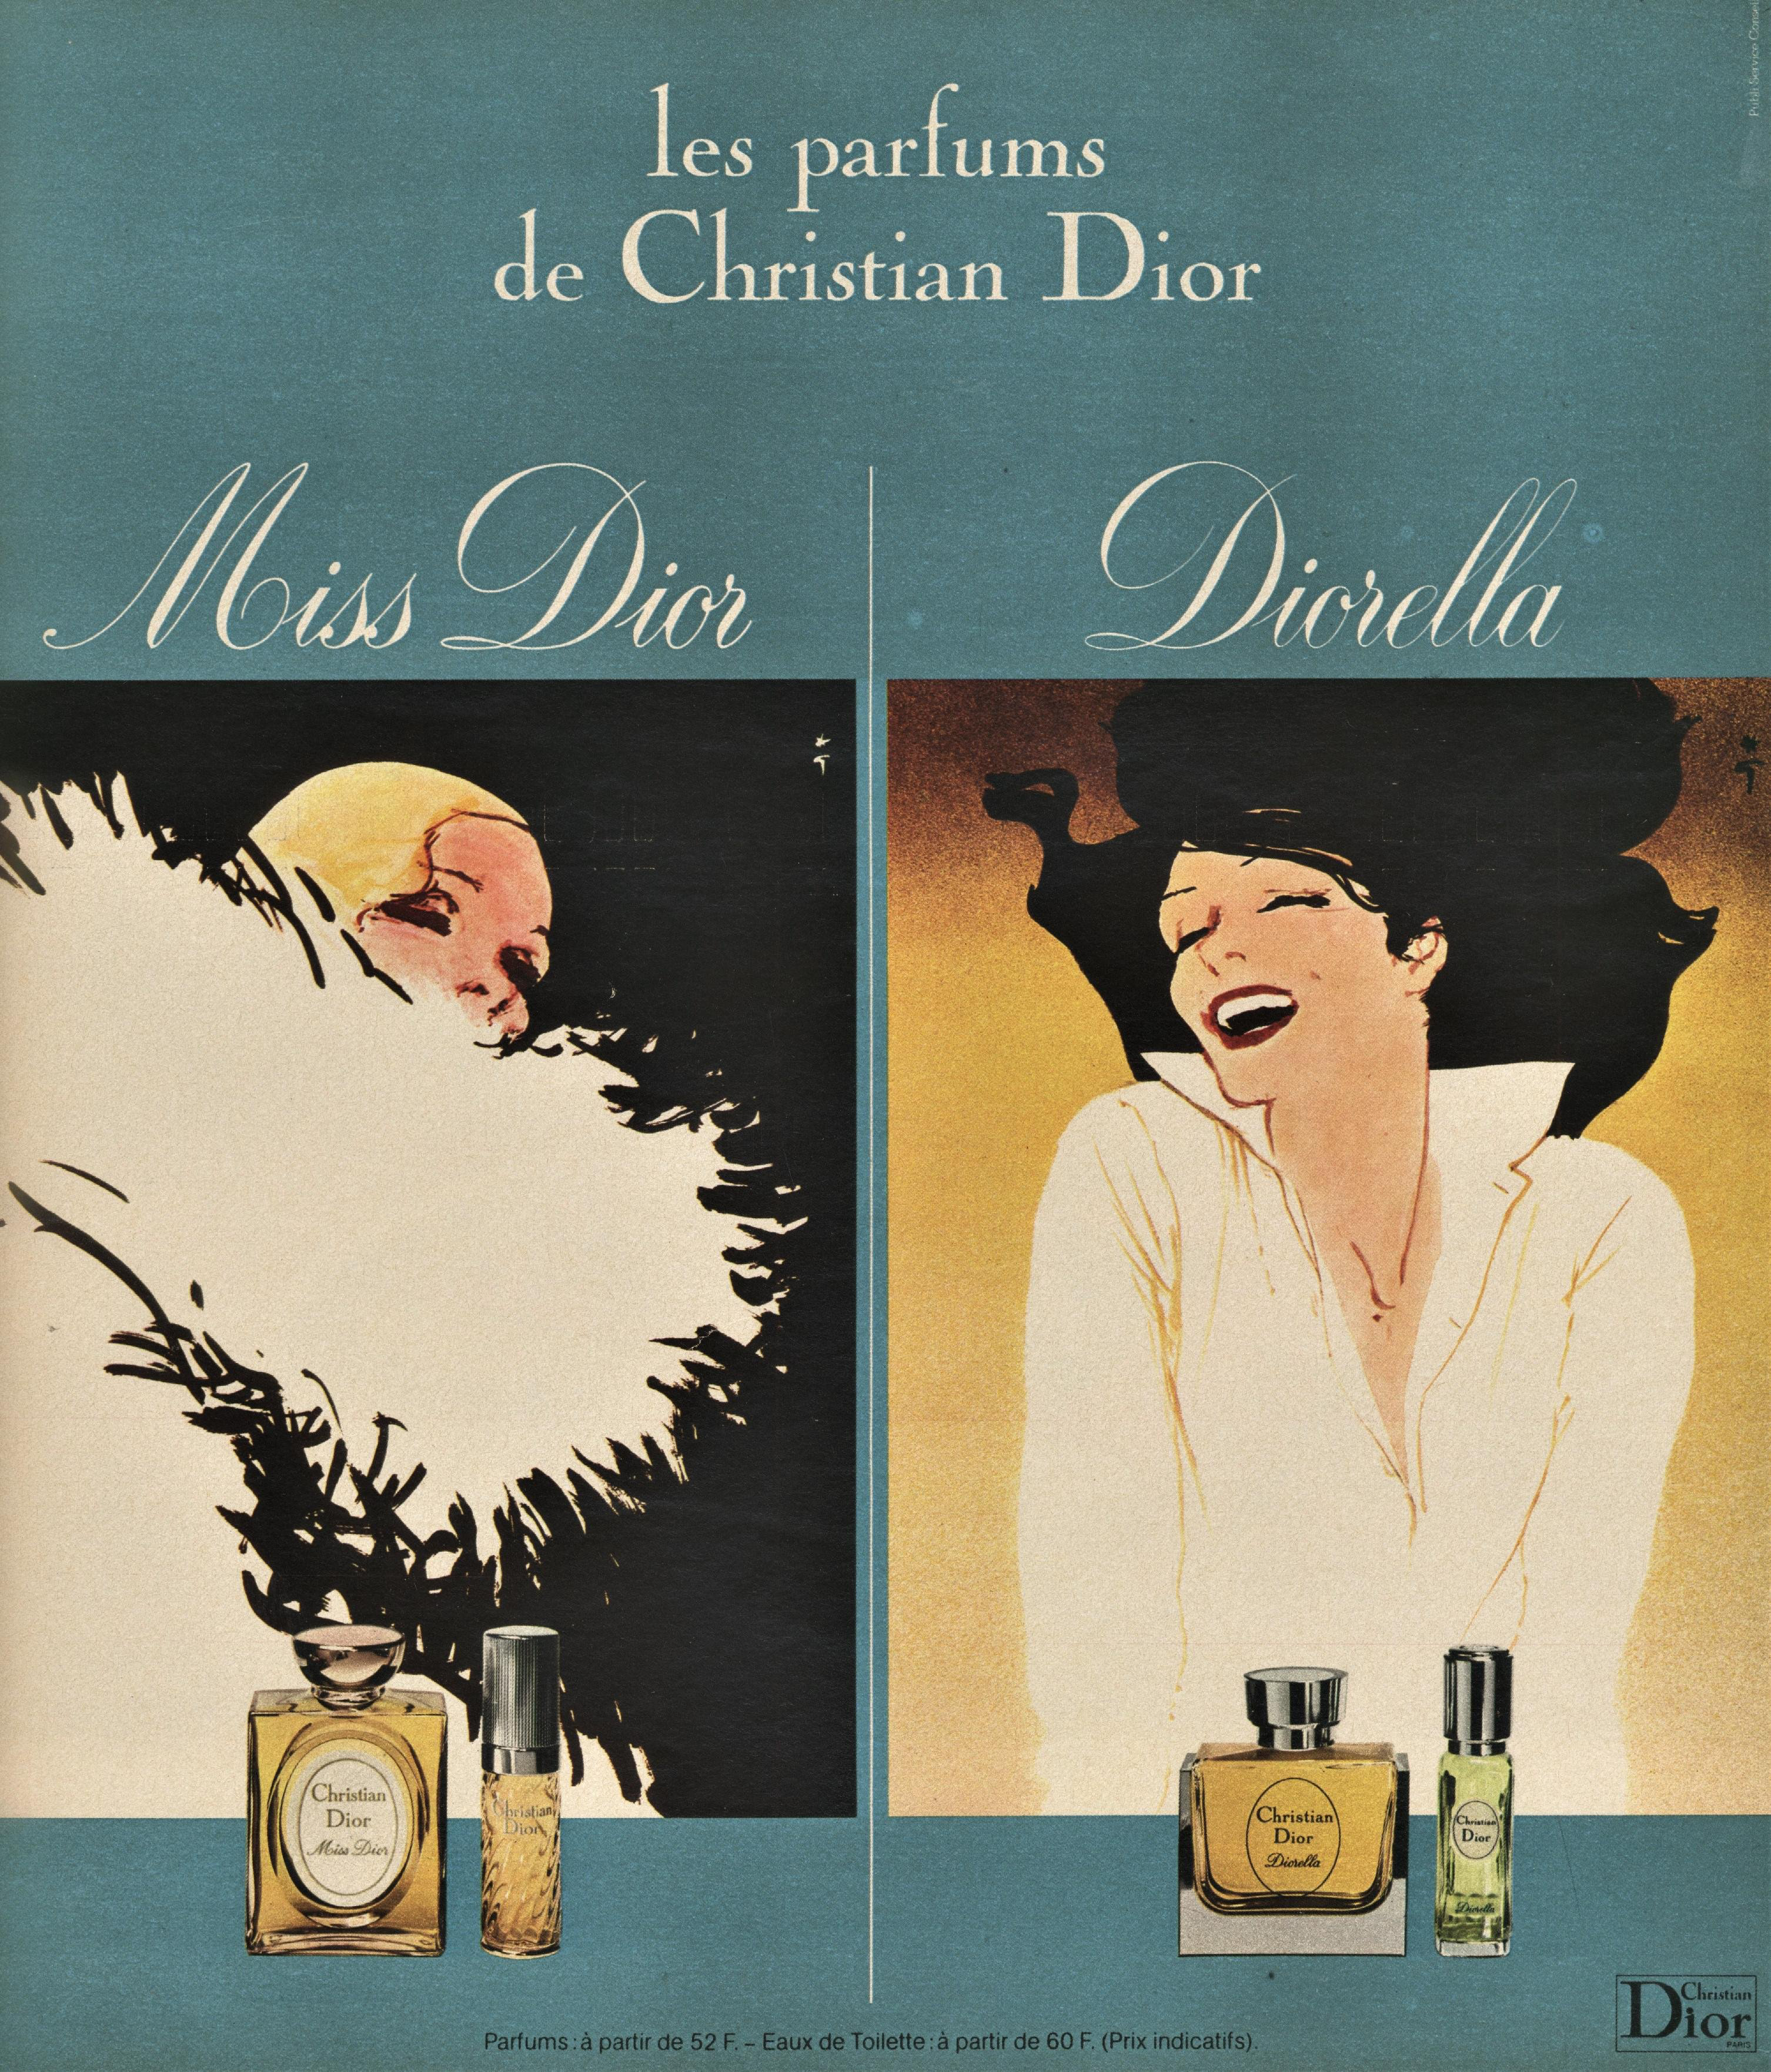 6c87794b2 Matted Vintage French Dior Perfume Print by Gruau